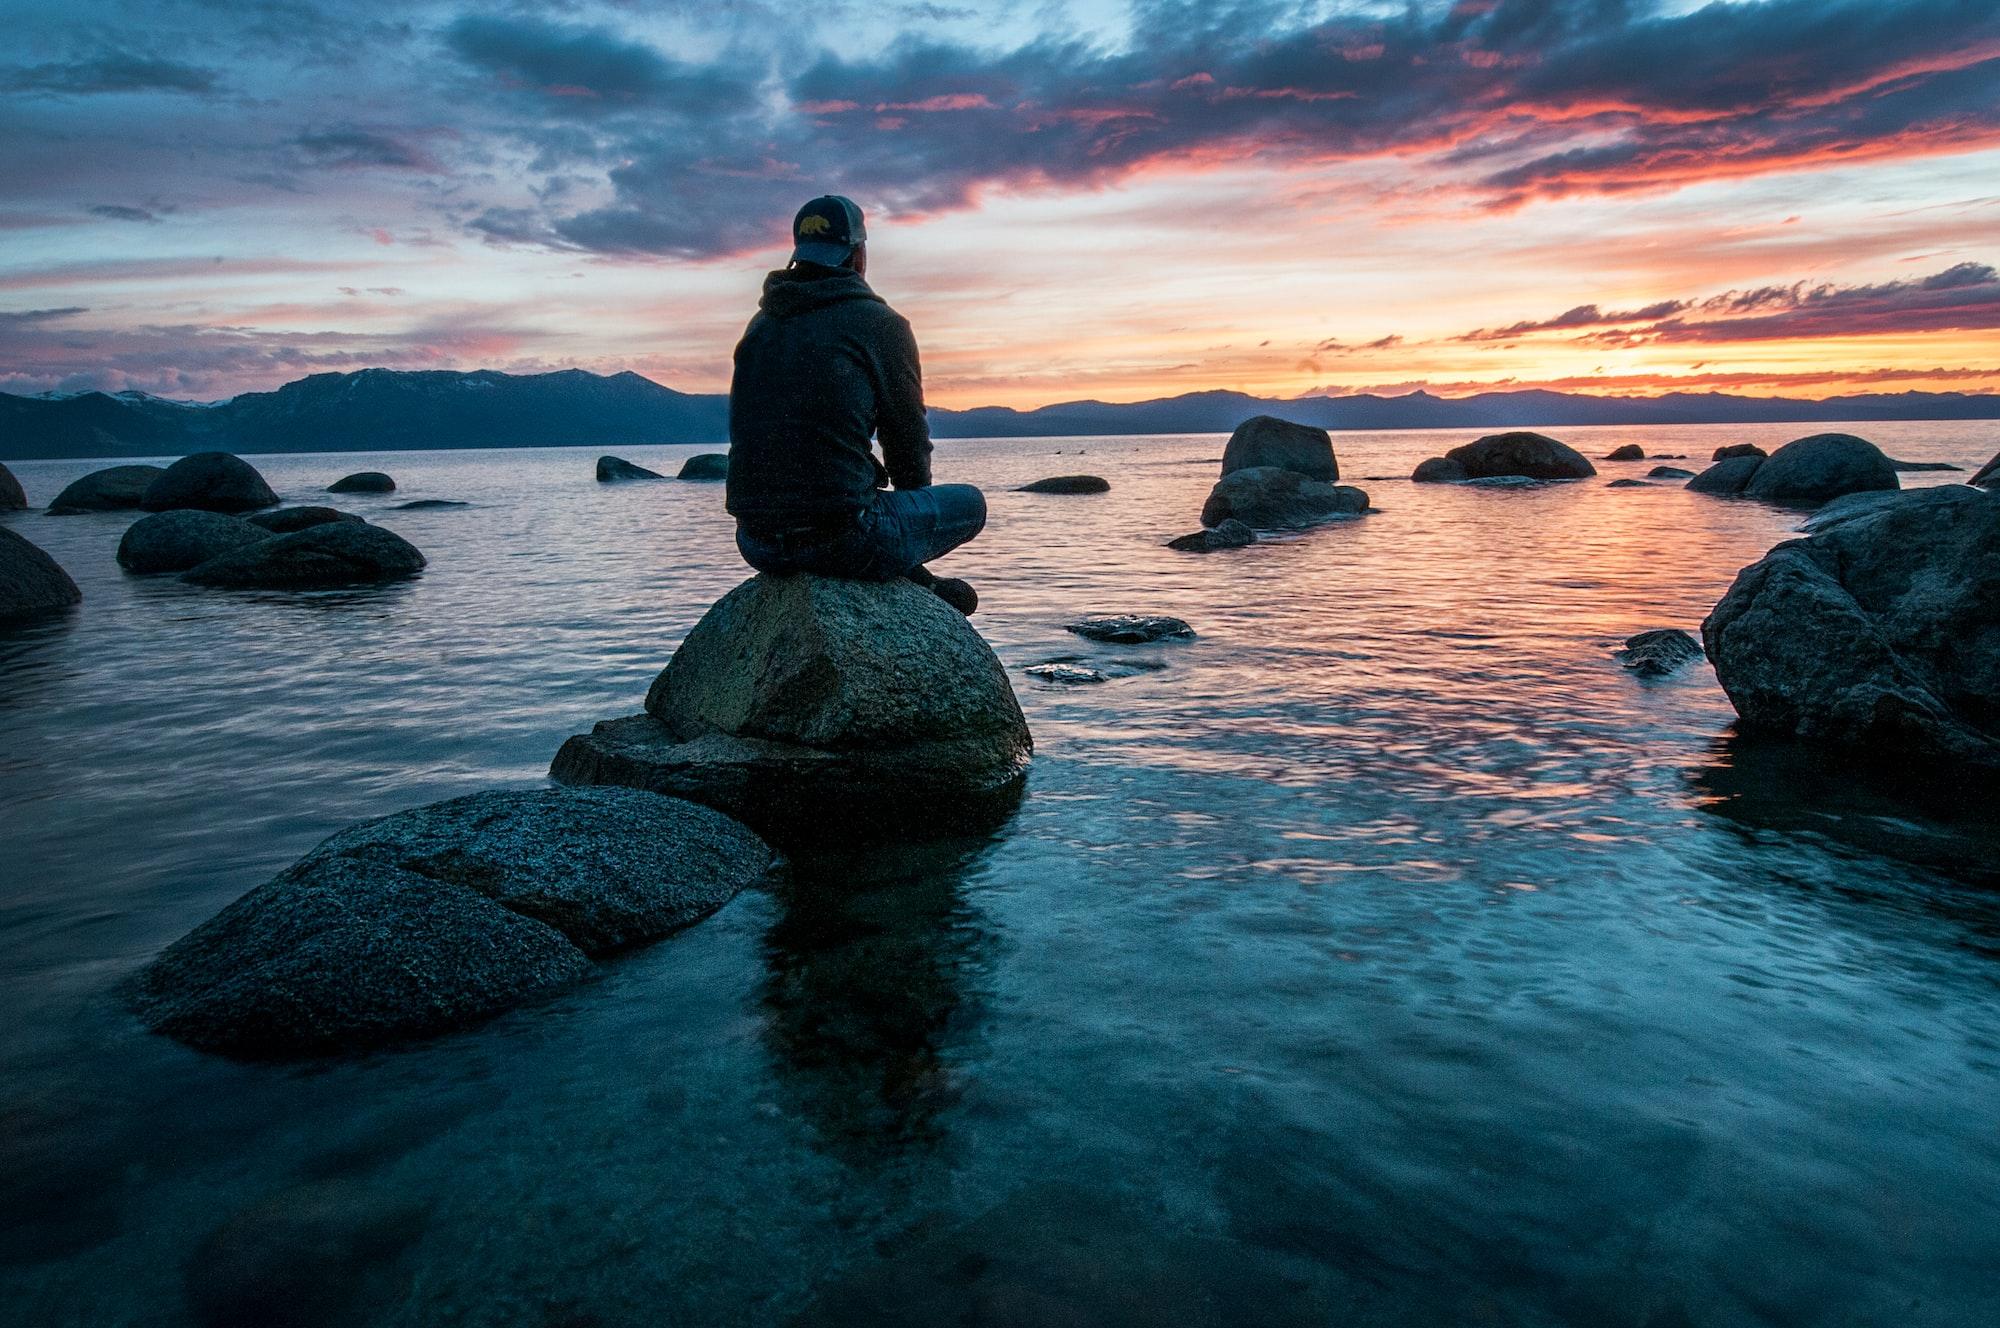 Science of Meditation - Benefits of Meditation and Mindfulness Explained